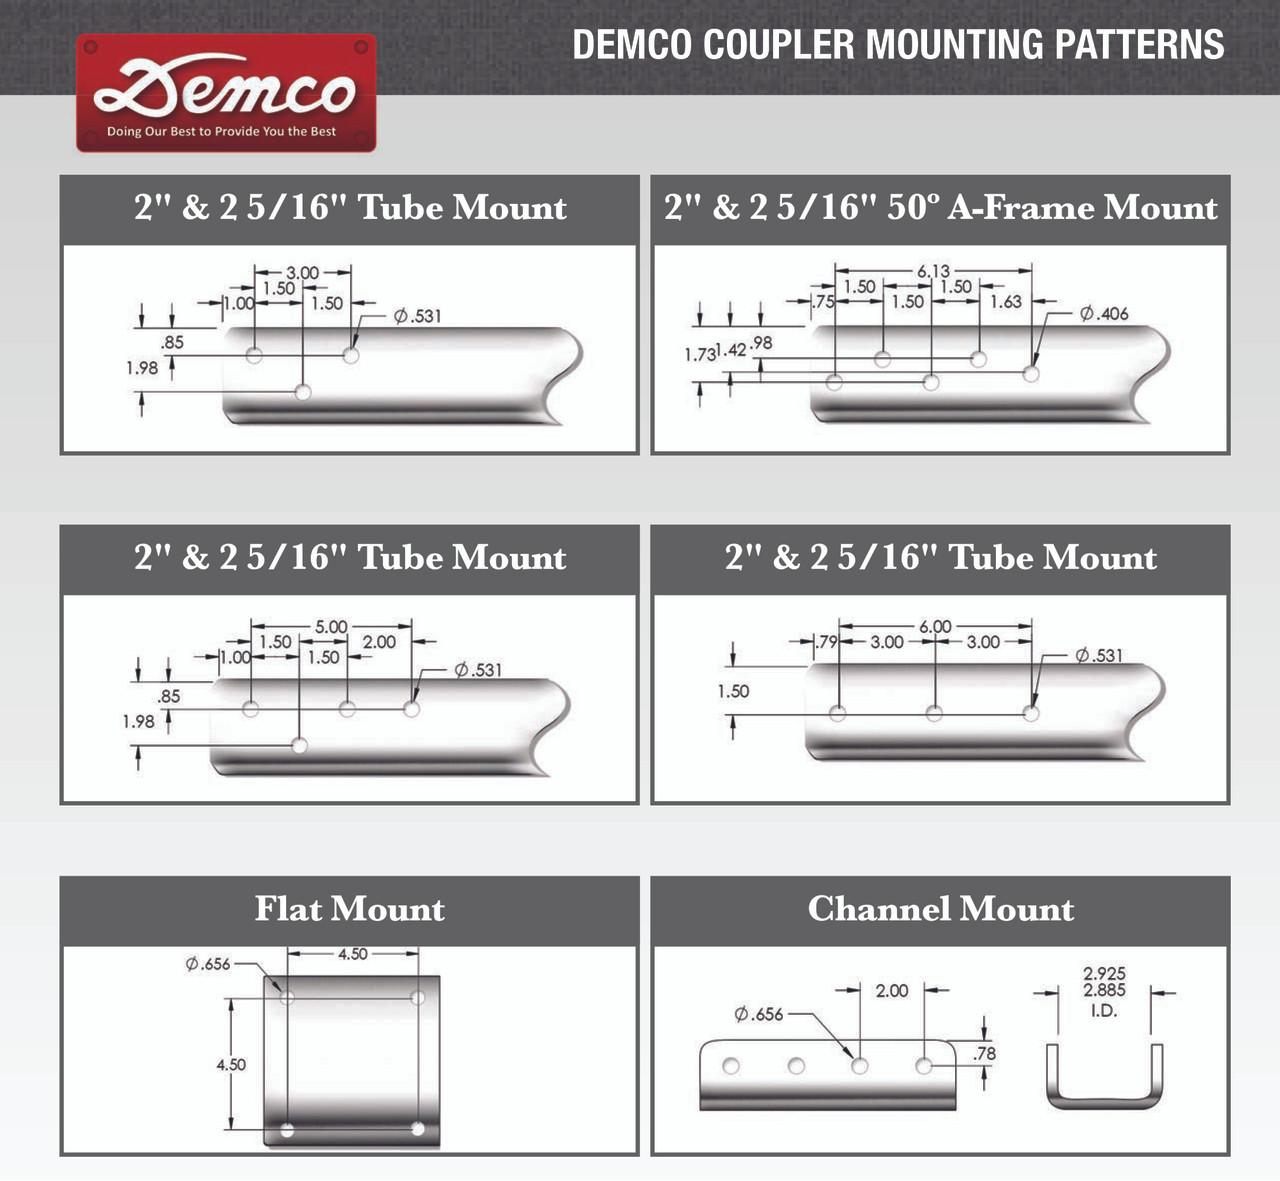 "15931-95 --- Demco eZ Latch 2-5/16"" Coupler fits 3"" tongue - 21,000 lb Capacity"